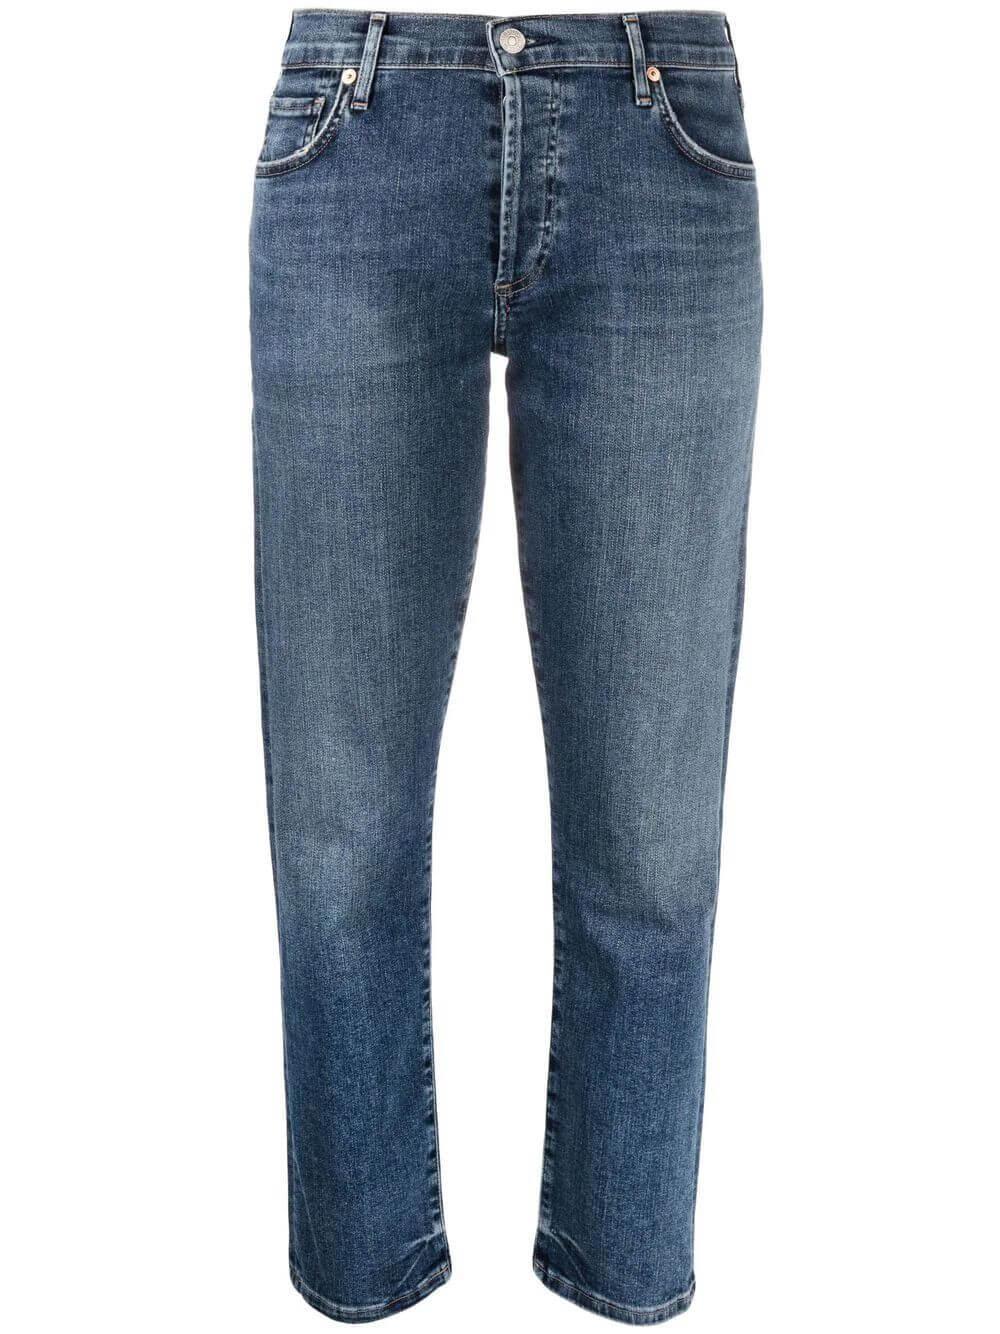 Emerson Cropped Straight Leg Jean Item # 1797B-372